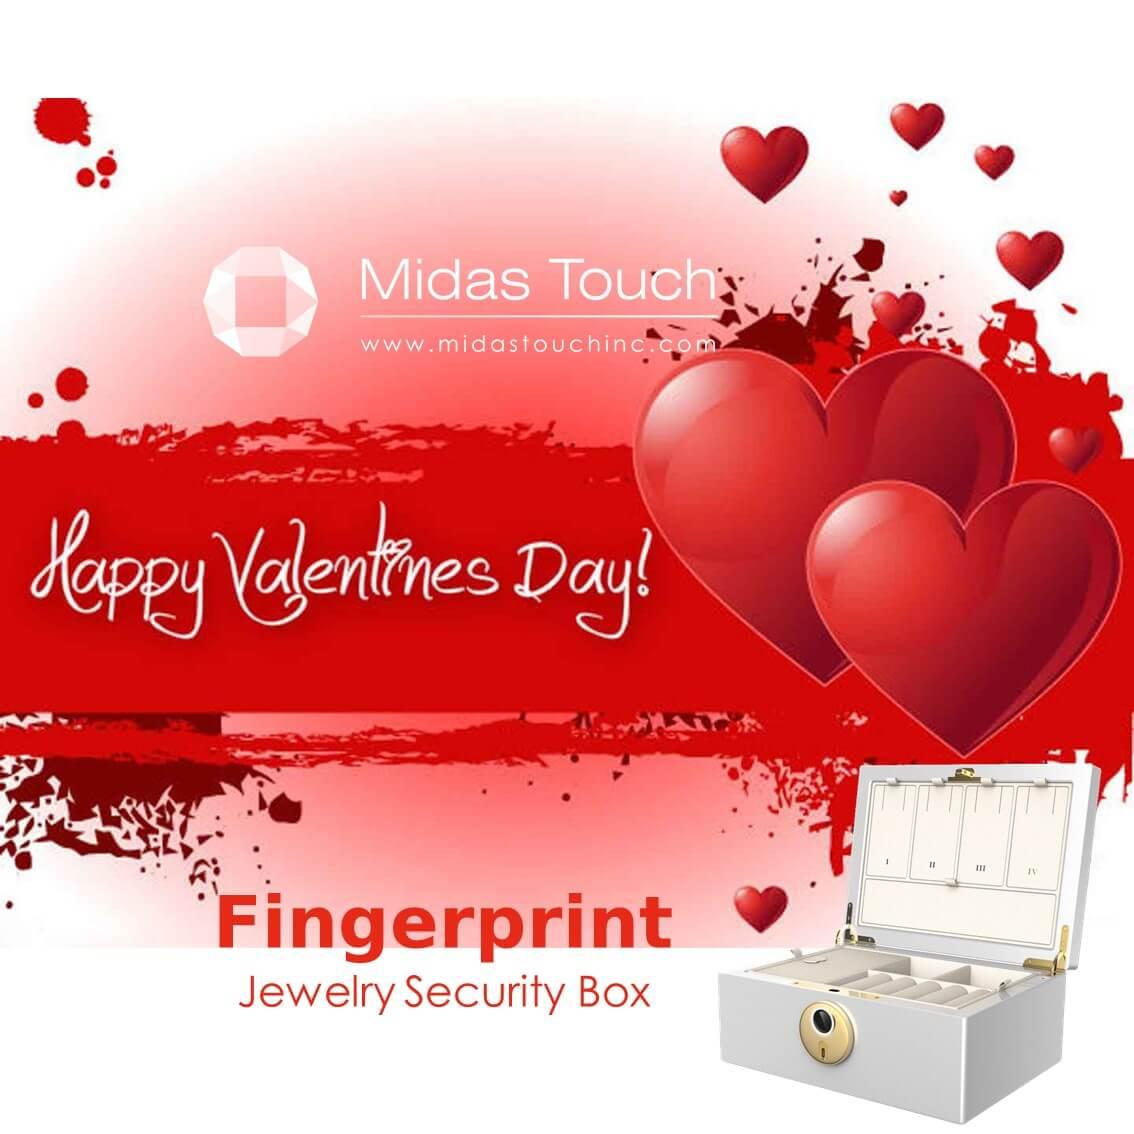 Happy Valetines Day | Midas Touch